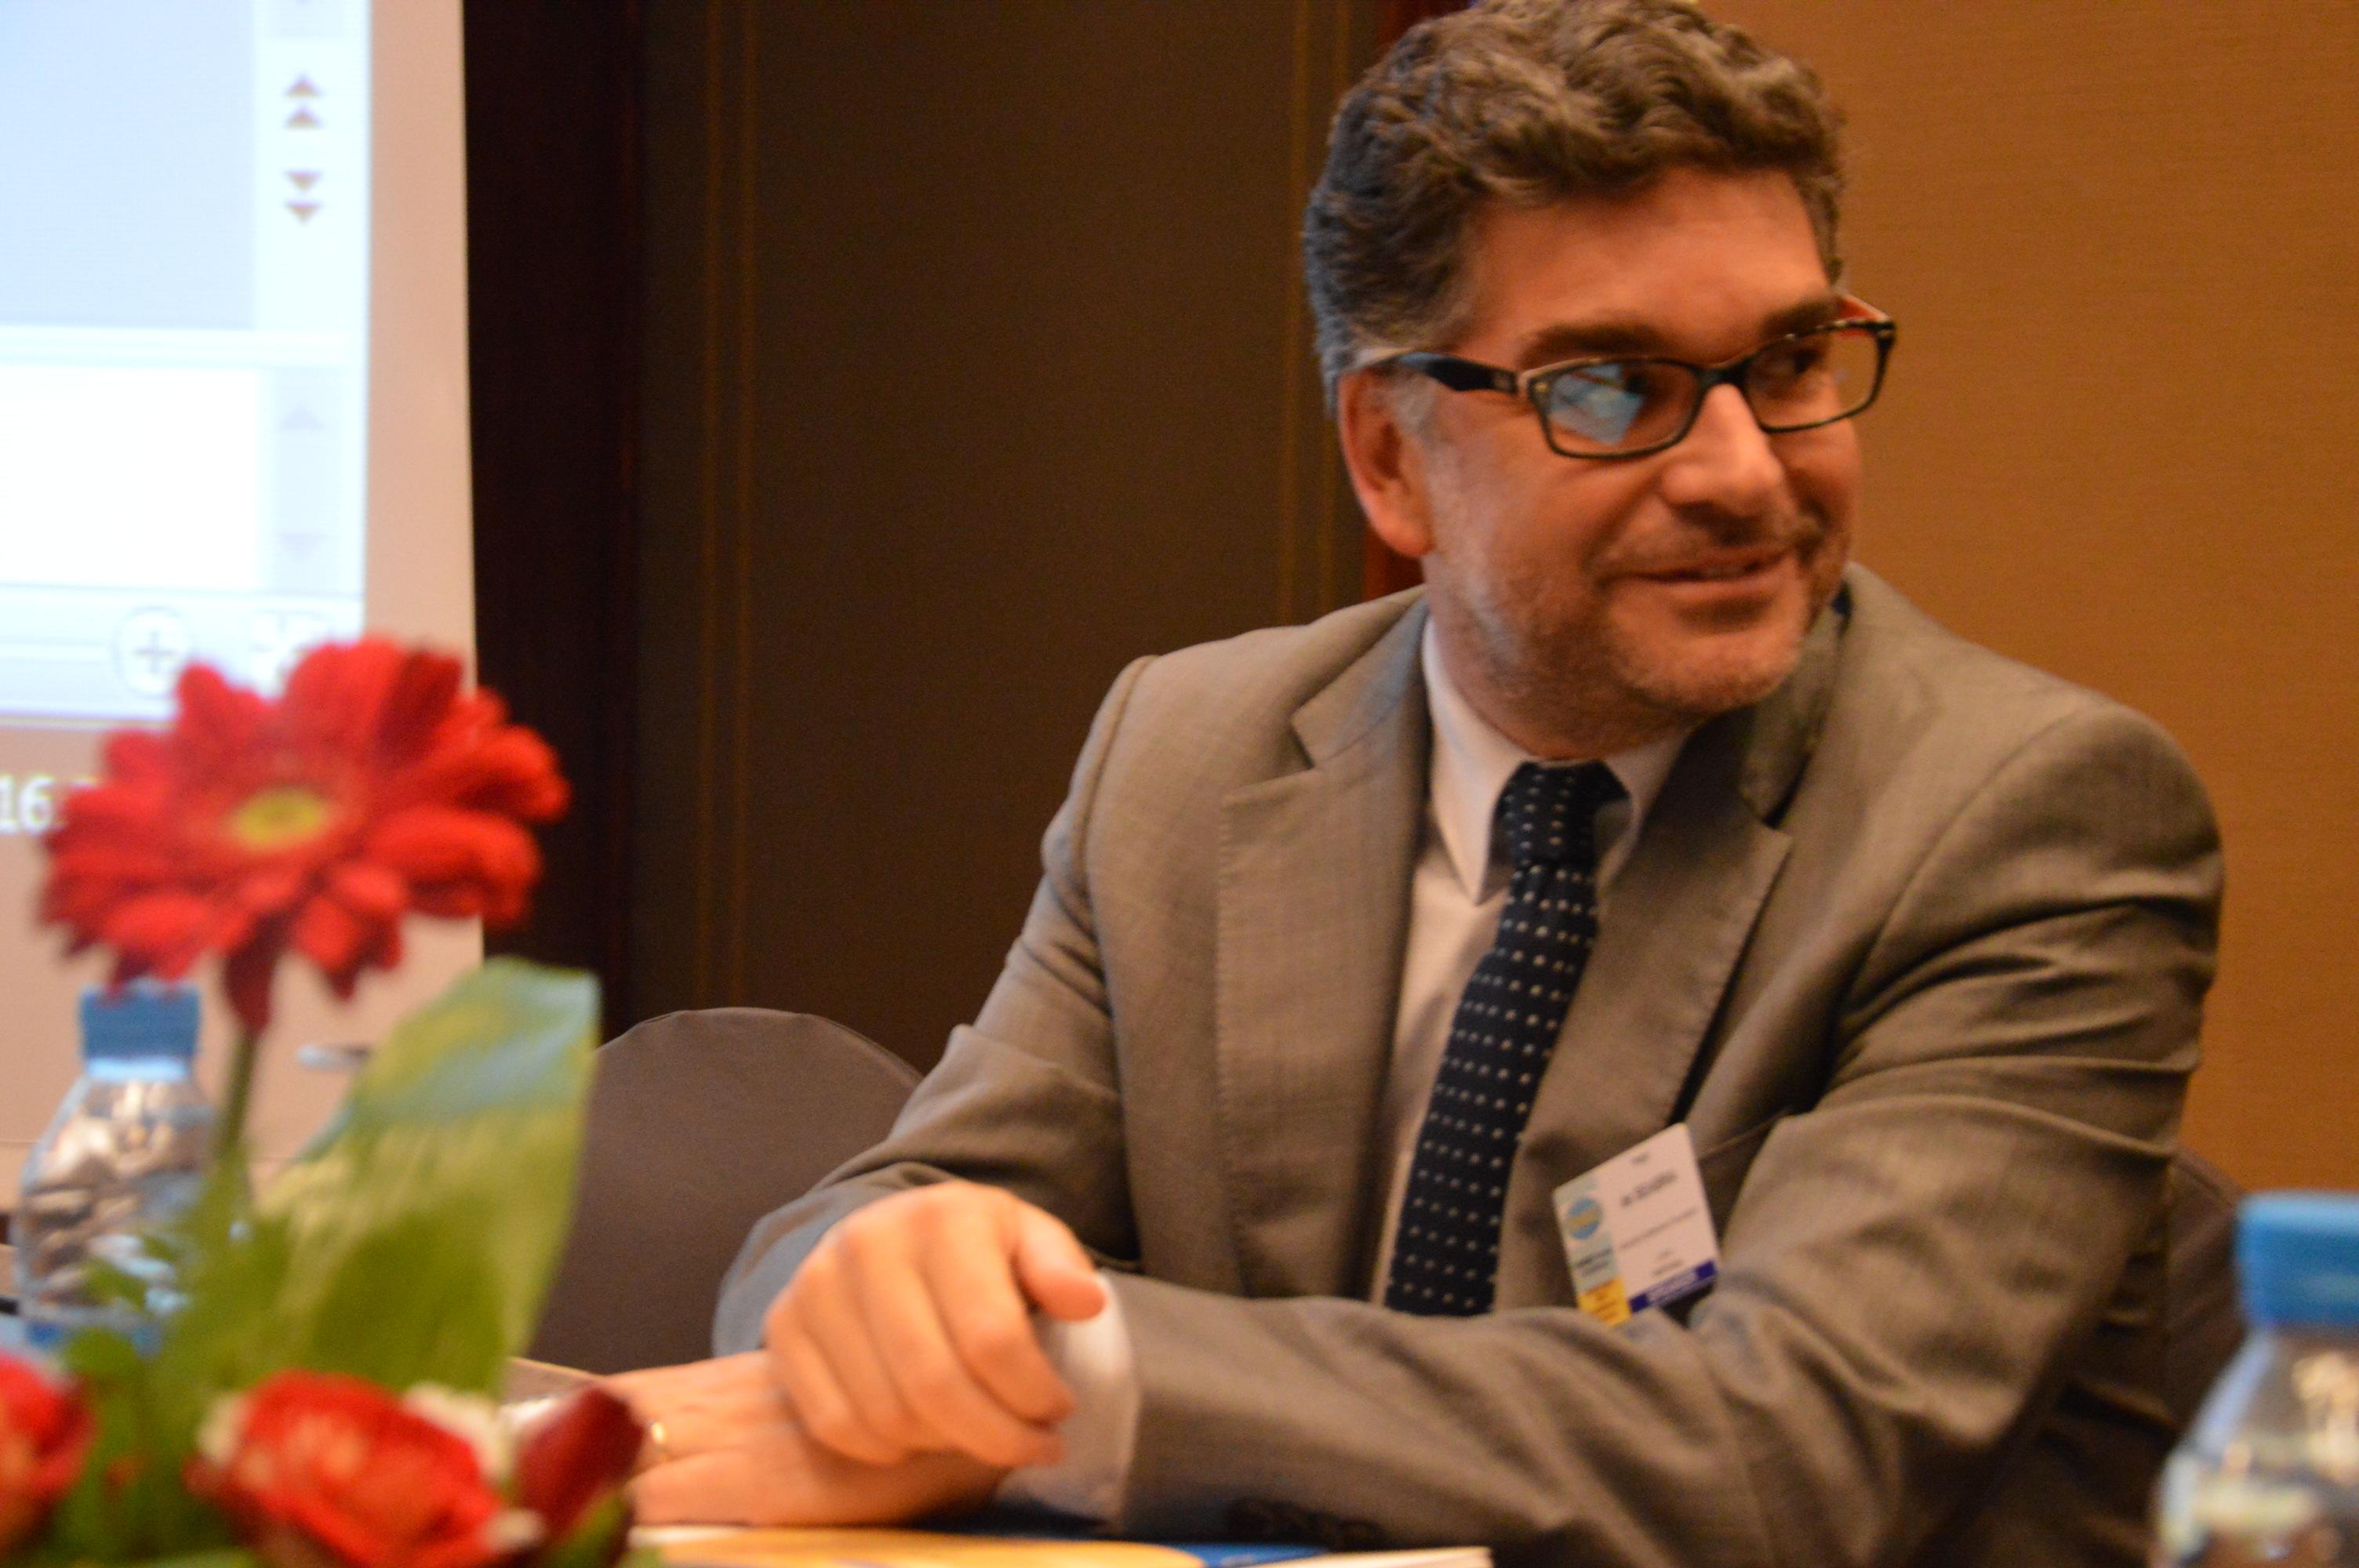 Hugo de Seabra, FEMISE conference 2017